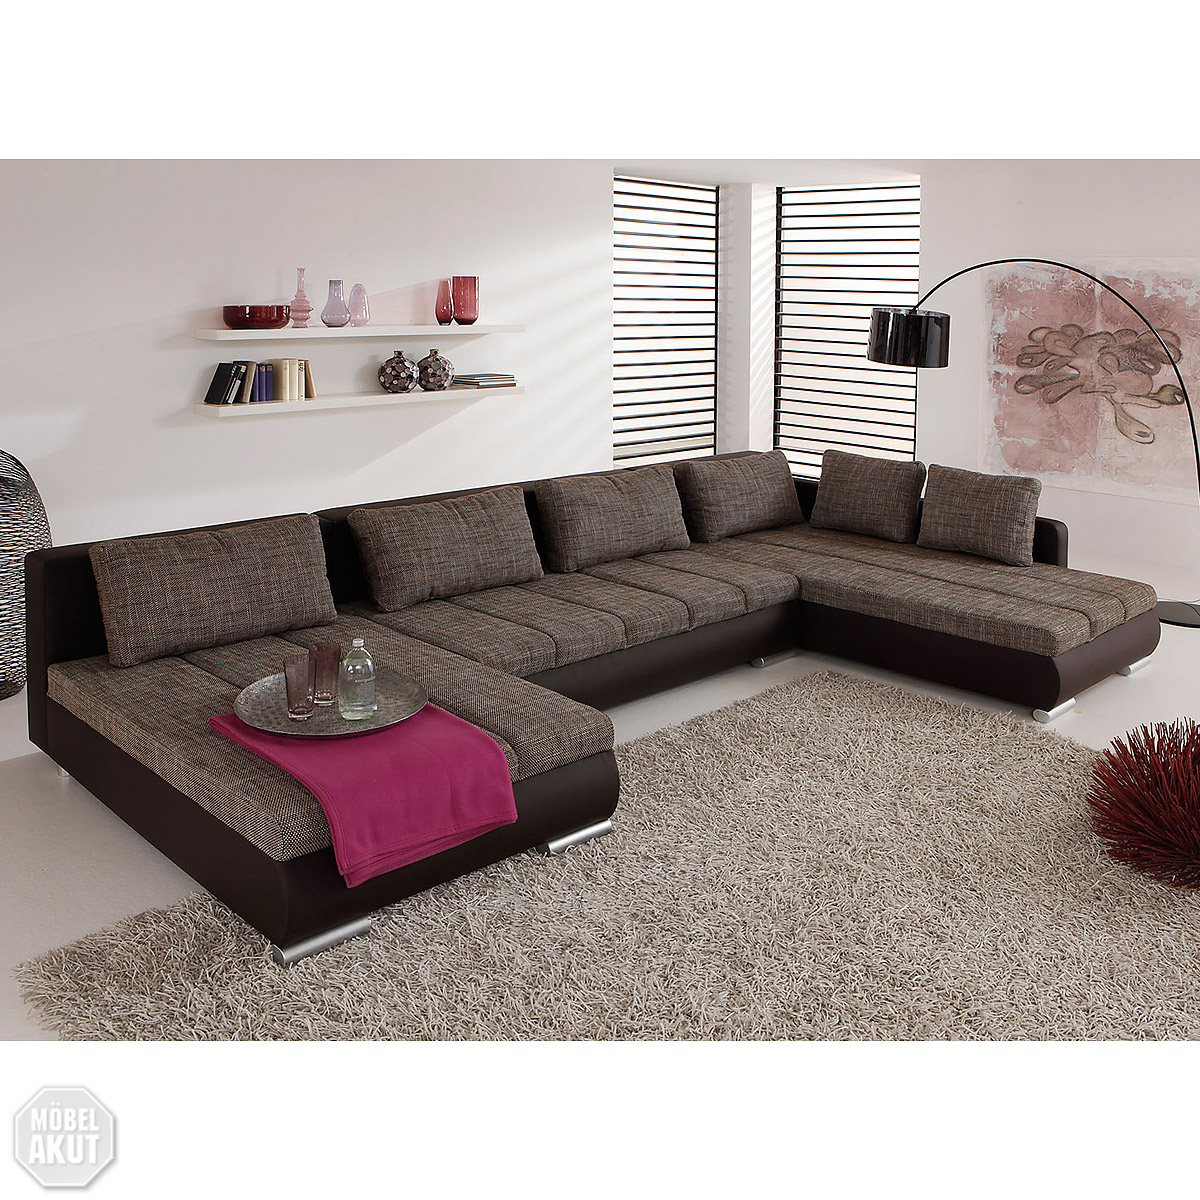 wohnlandschaft honor sofa eck sofa in braun mokka inkl kissen neu ebay. Black Bedroom Furniture Sets. Home Design Ideas